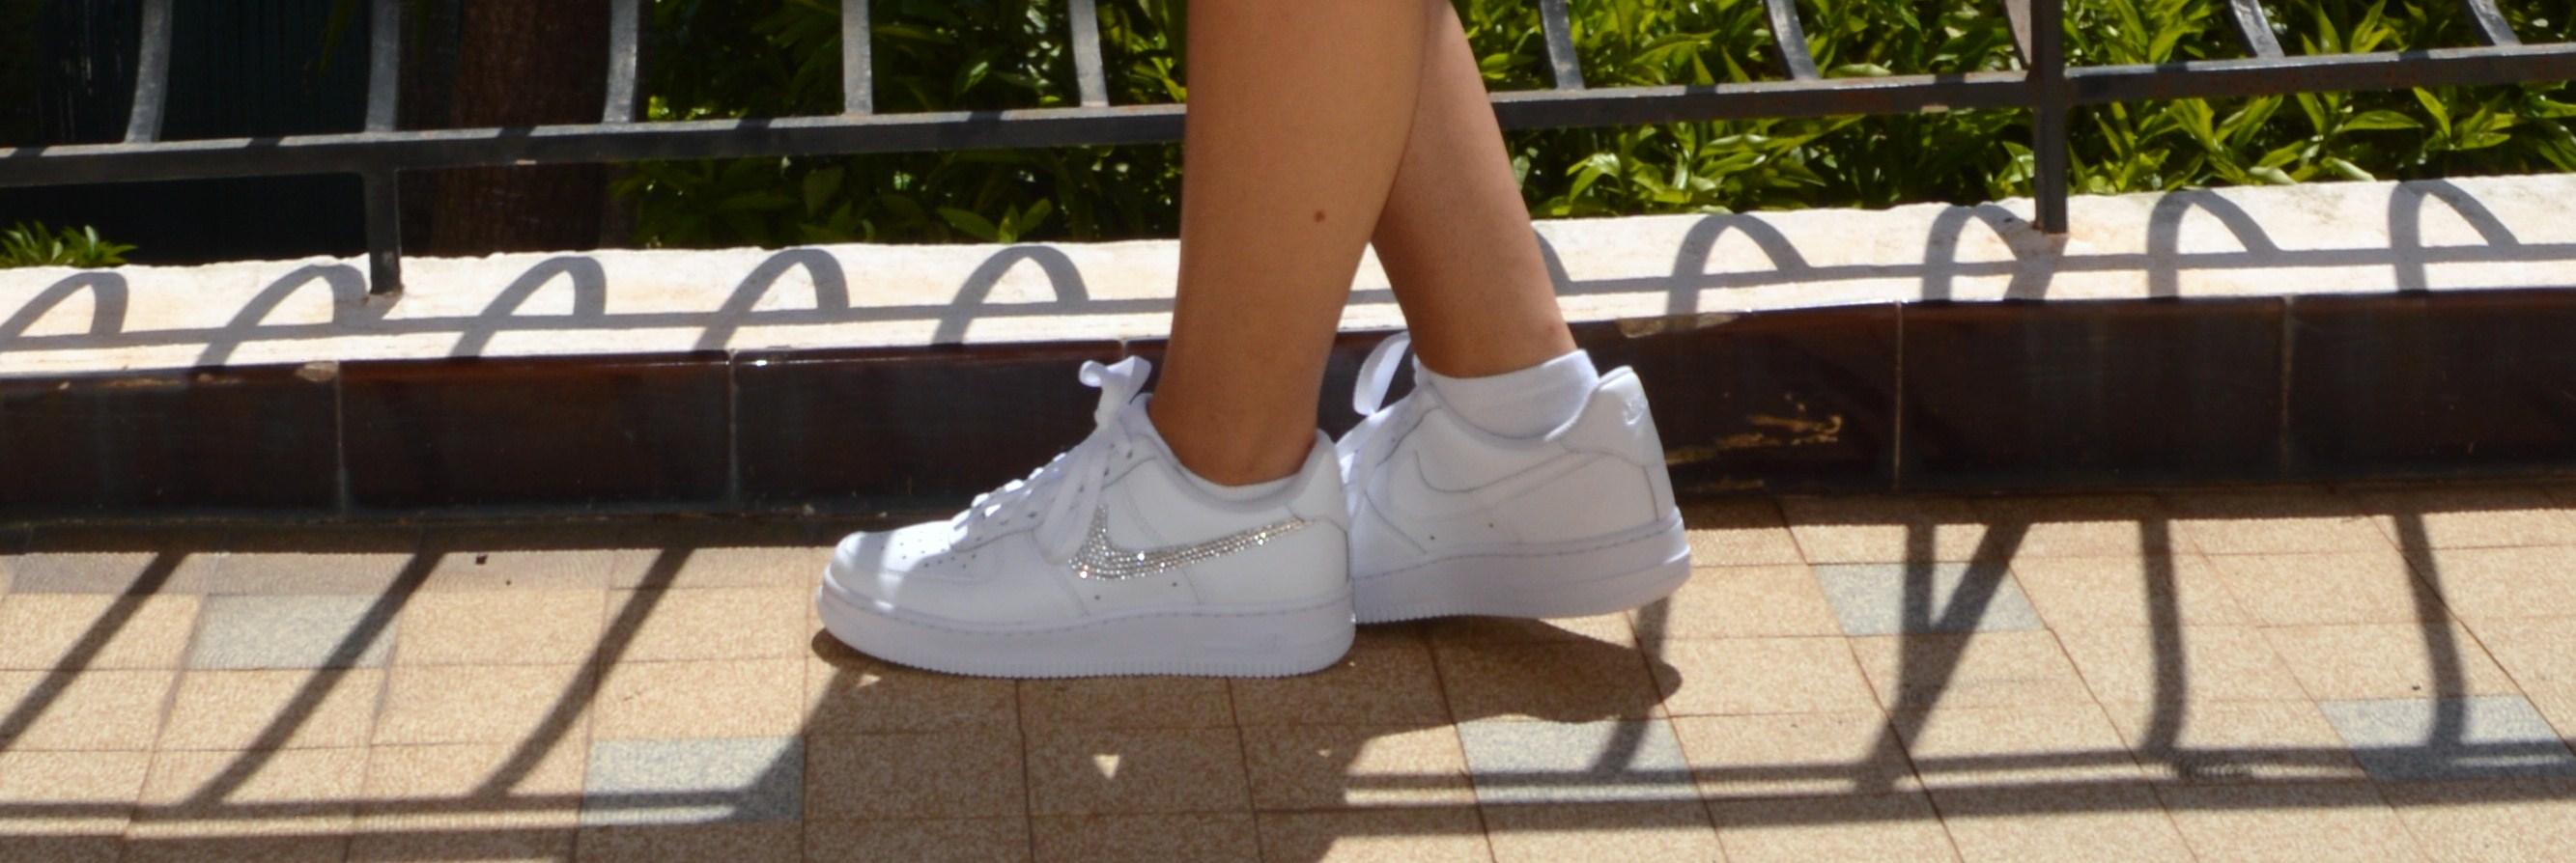 Nike Chaussure Chaussure Chaussure Nike Strass Nike Nike Chaussure Chaussure Strass Strass Strass 534jqALR